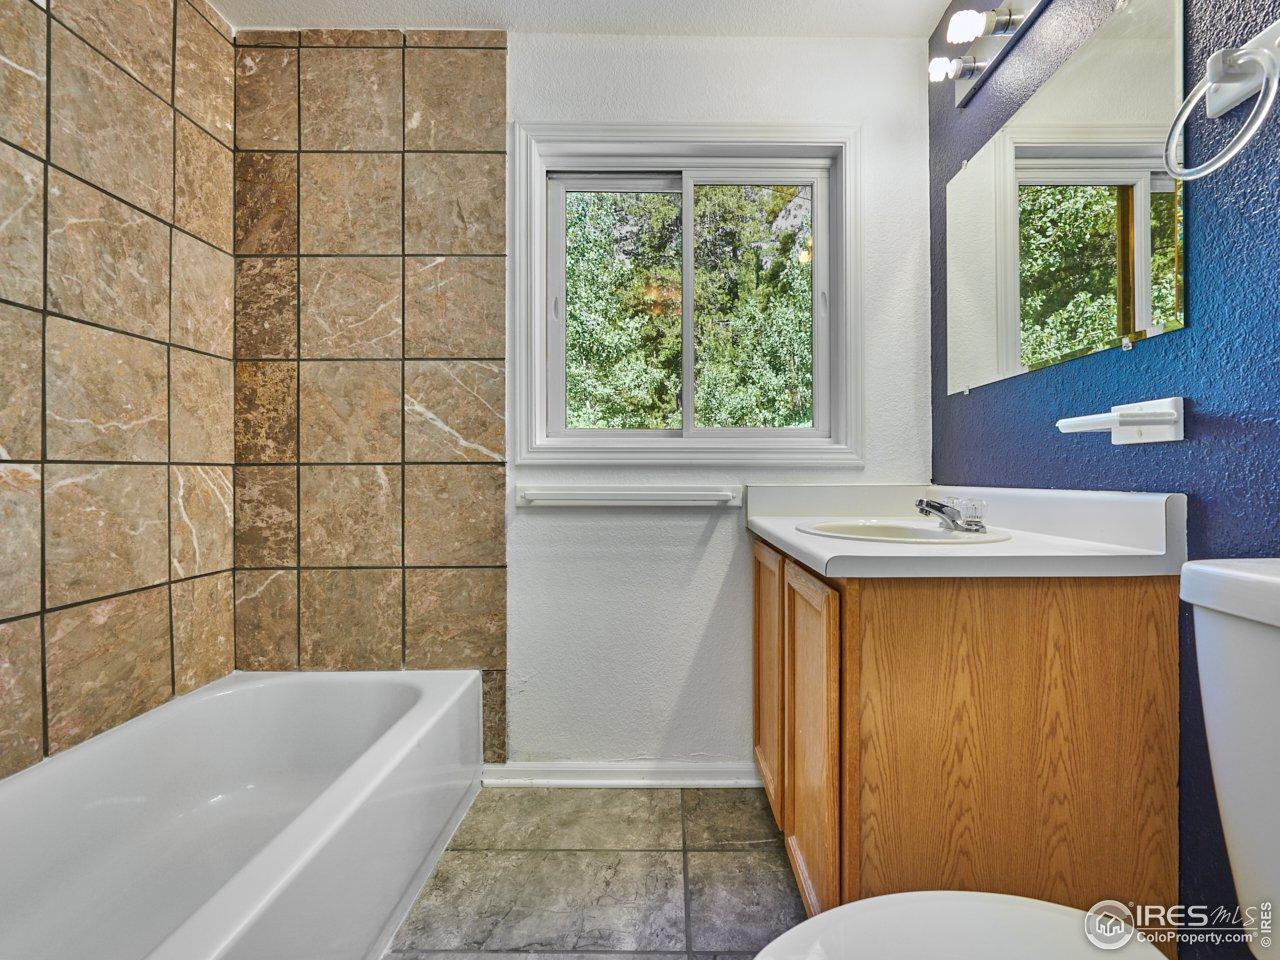 Upper full bathroom